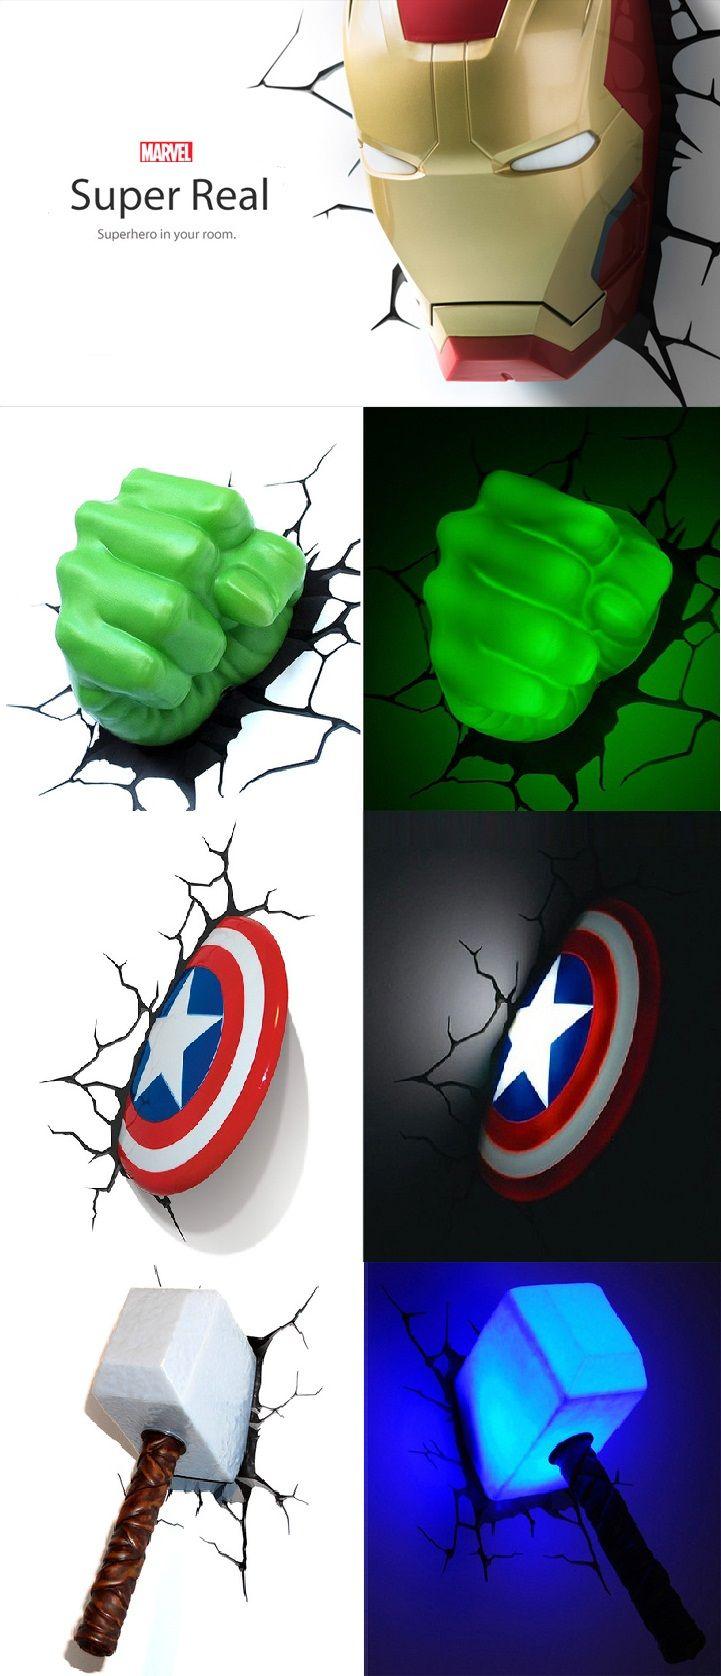 Superhero Room Design: Awesome 3D Marvel Superhero Nightlights Need To Start This